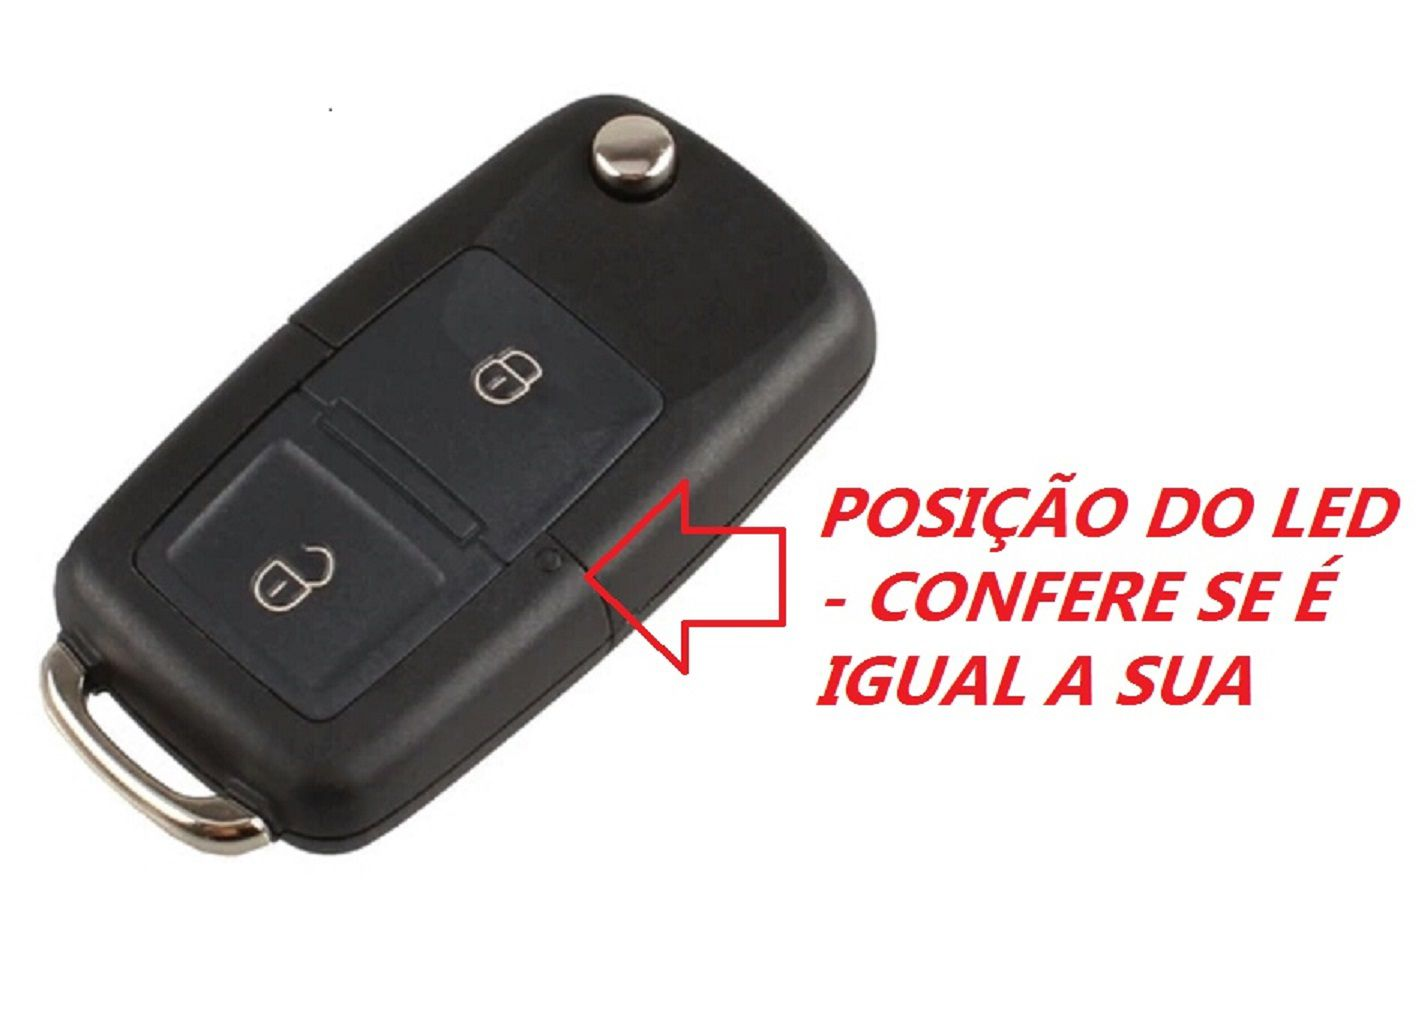 Chave Canivete Volkswagen VW Gol Golf Voyage Polo Fox Saveiro Parati 2B Lamina Emblema